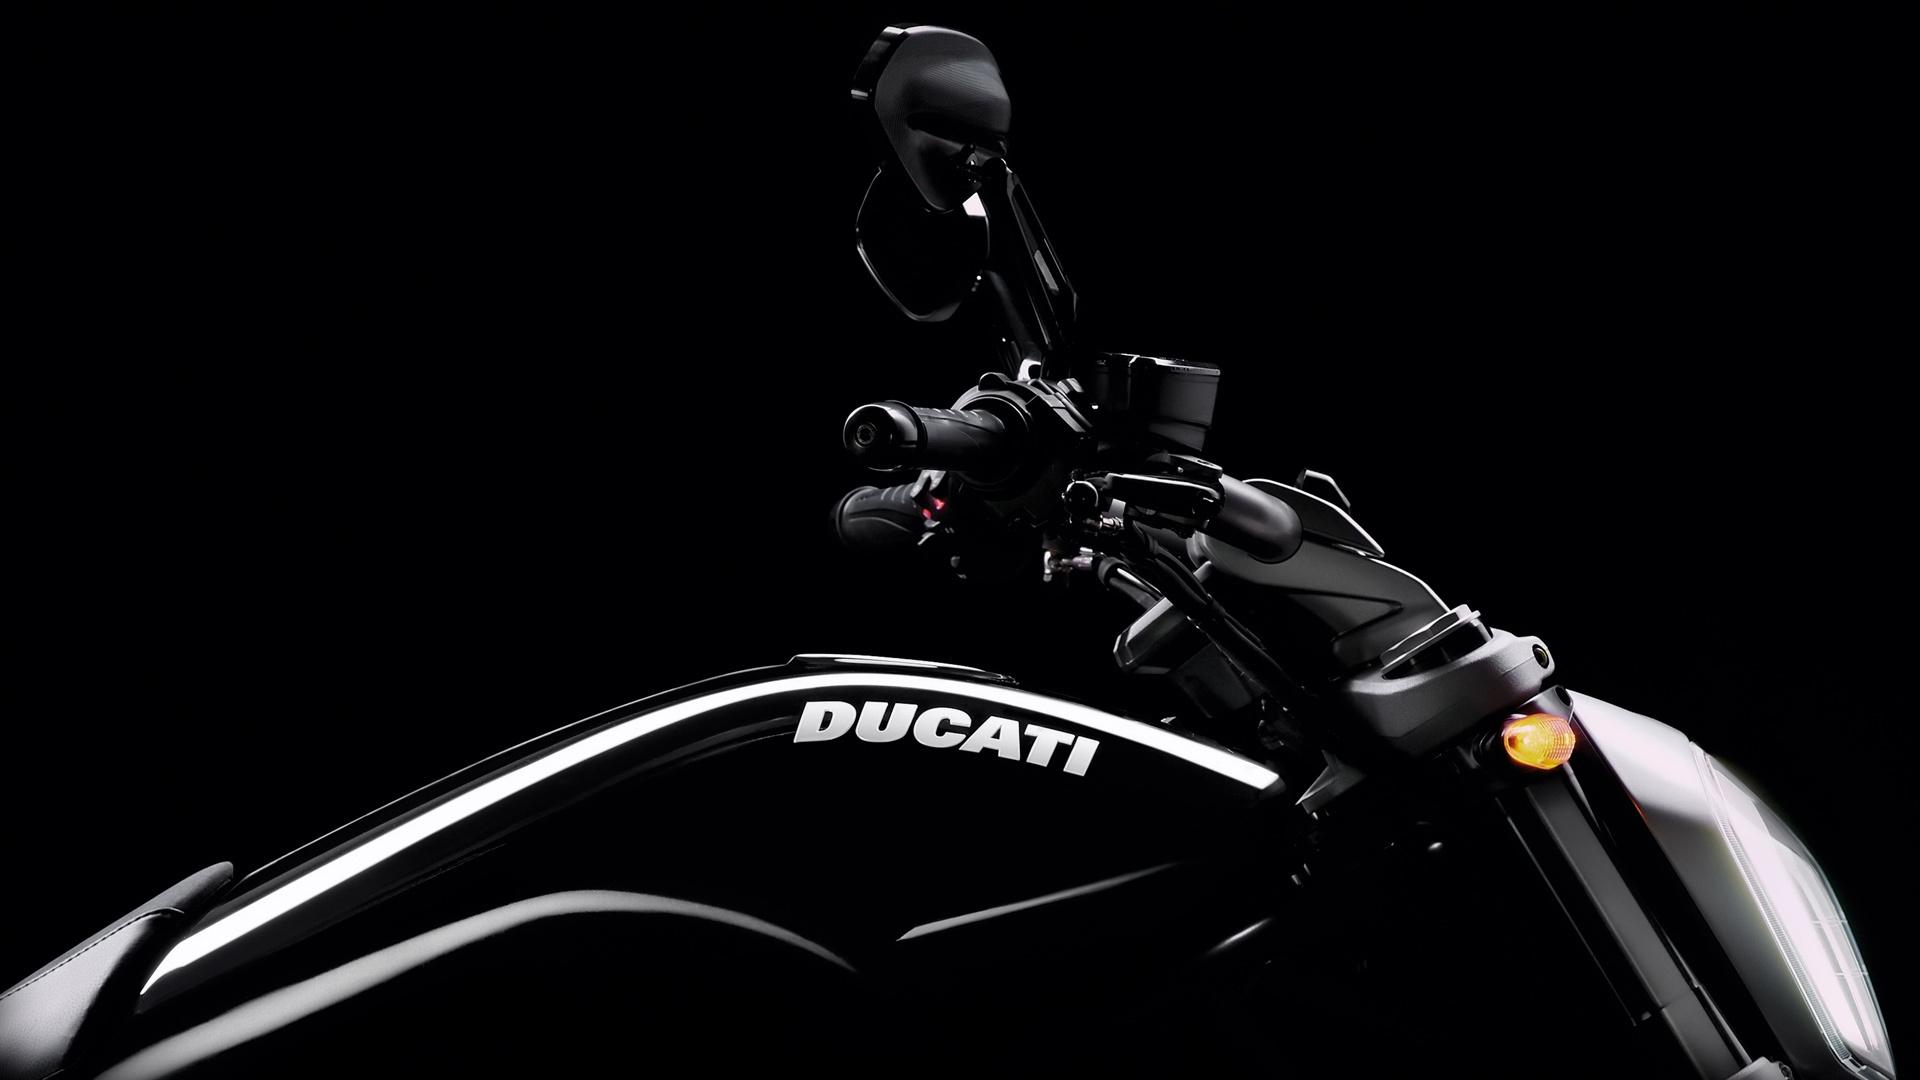 МОТОЦИКЛ DUCATI XDIAVEL S  Артмото - купить квадроцикл в украине и харькове, мотоцикл, снегоход, скутер, мопед, электромобиль